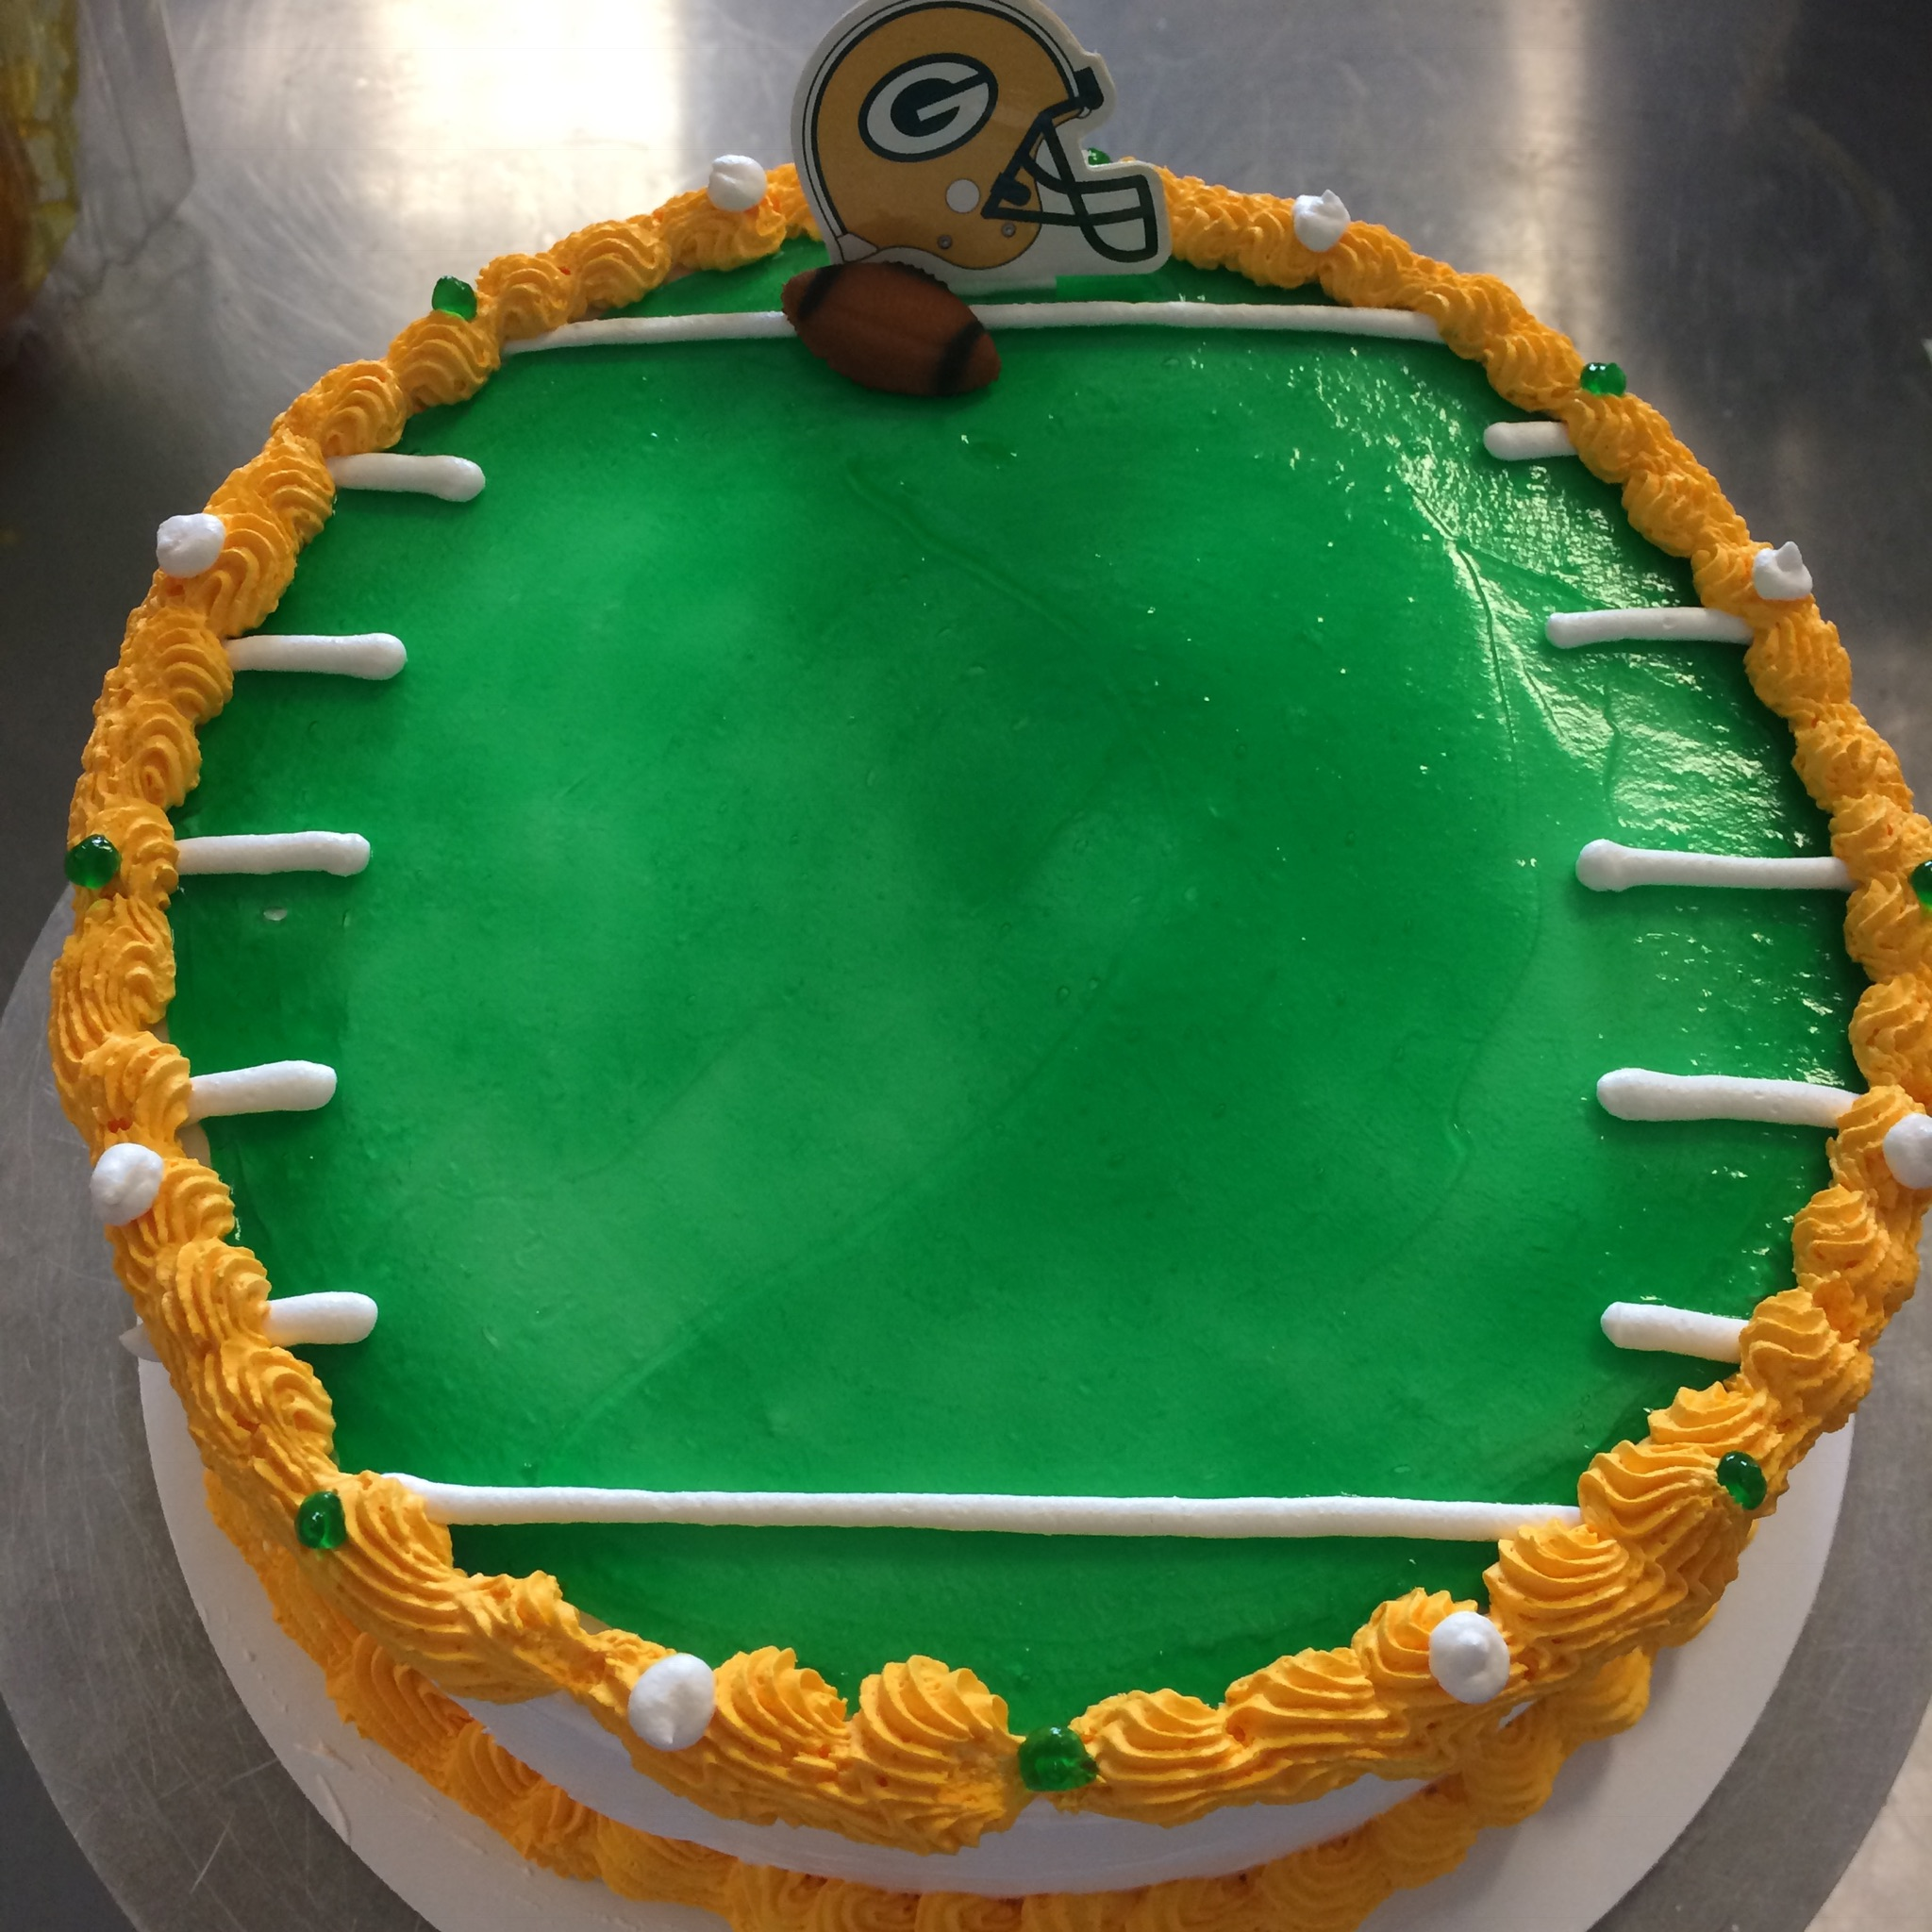 Cake Design #15